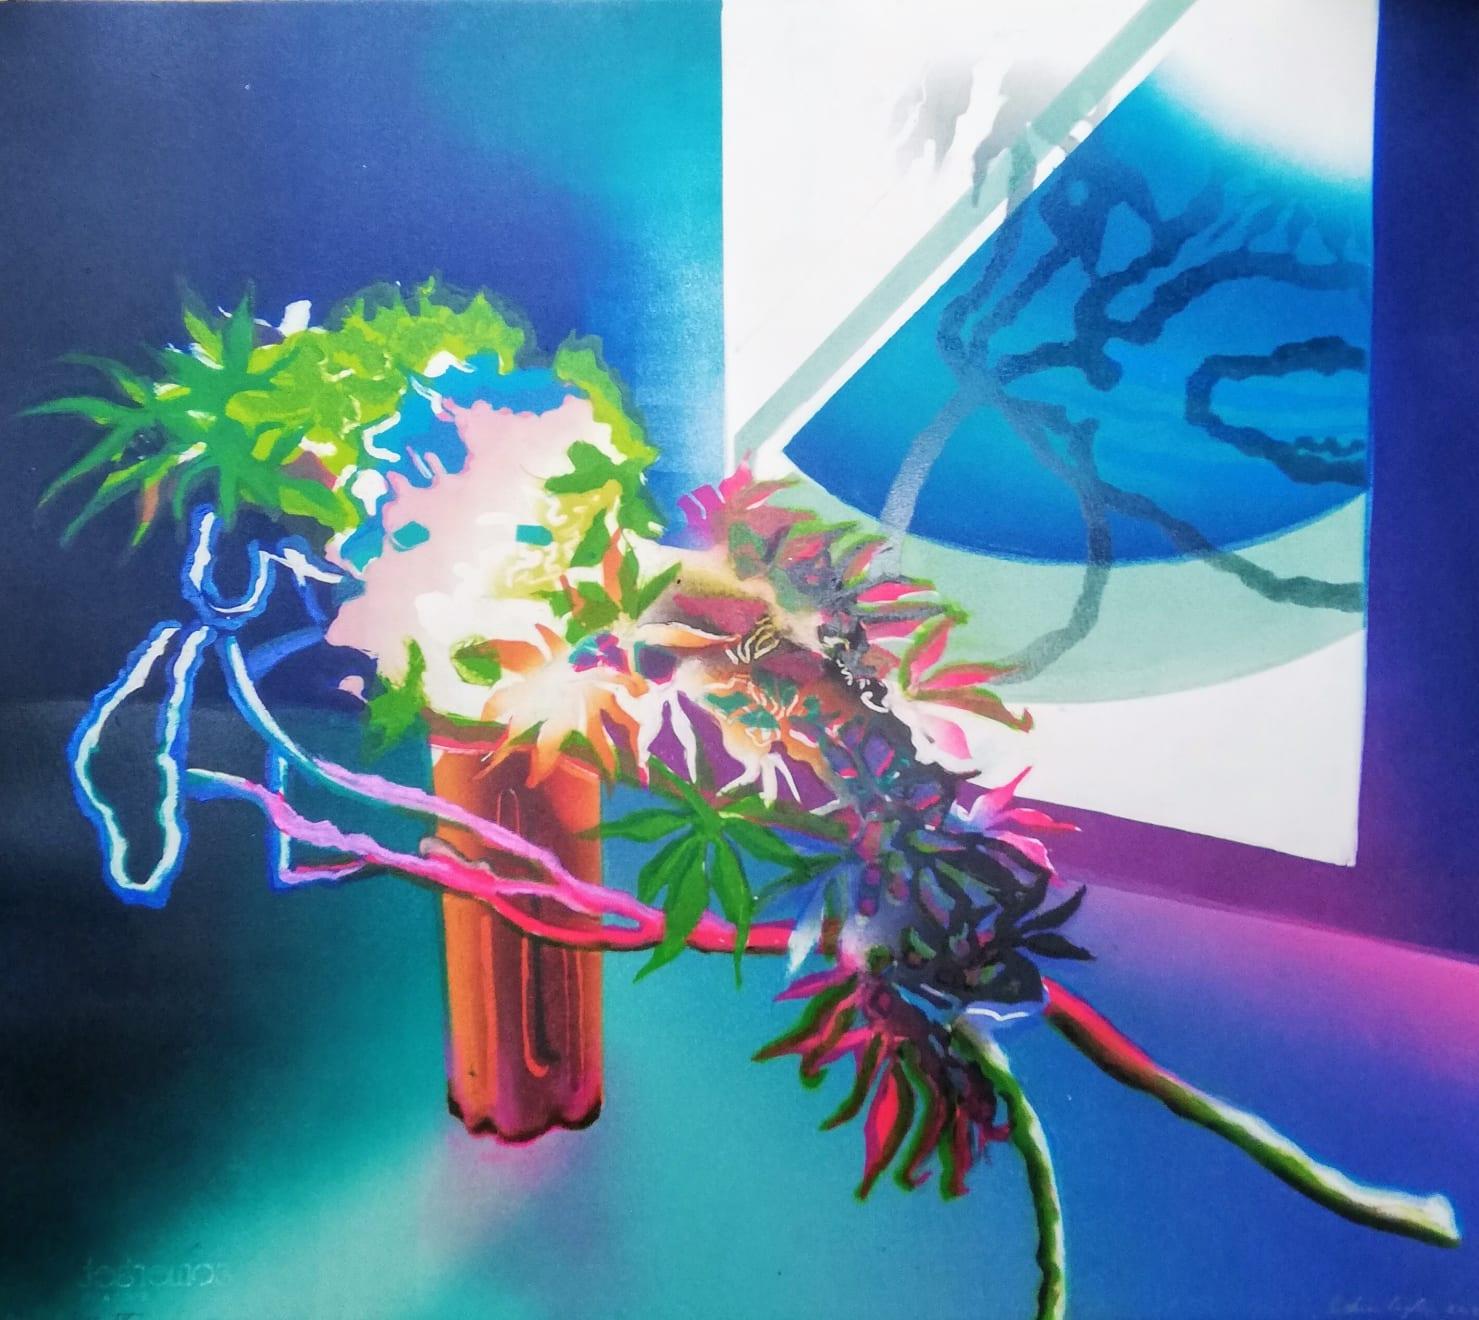 Sophie Layton, Acer Tree IV, 2020